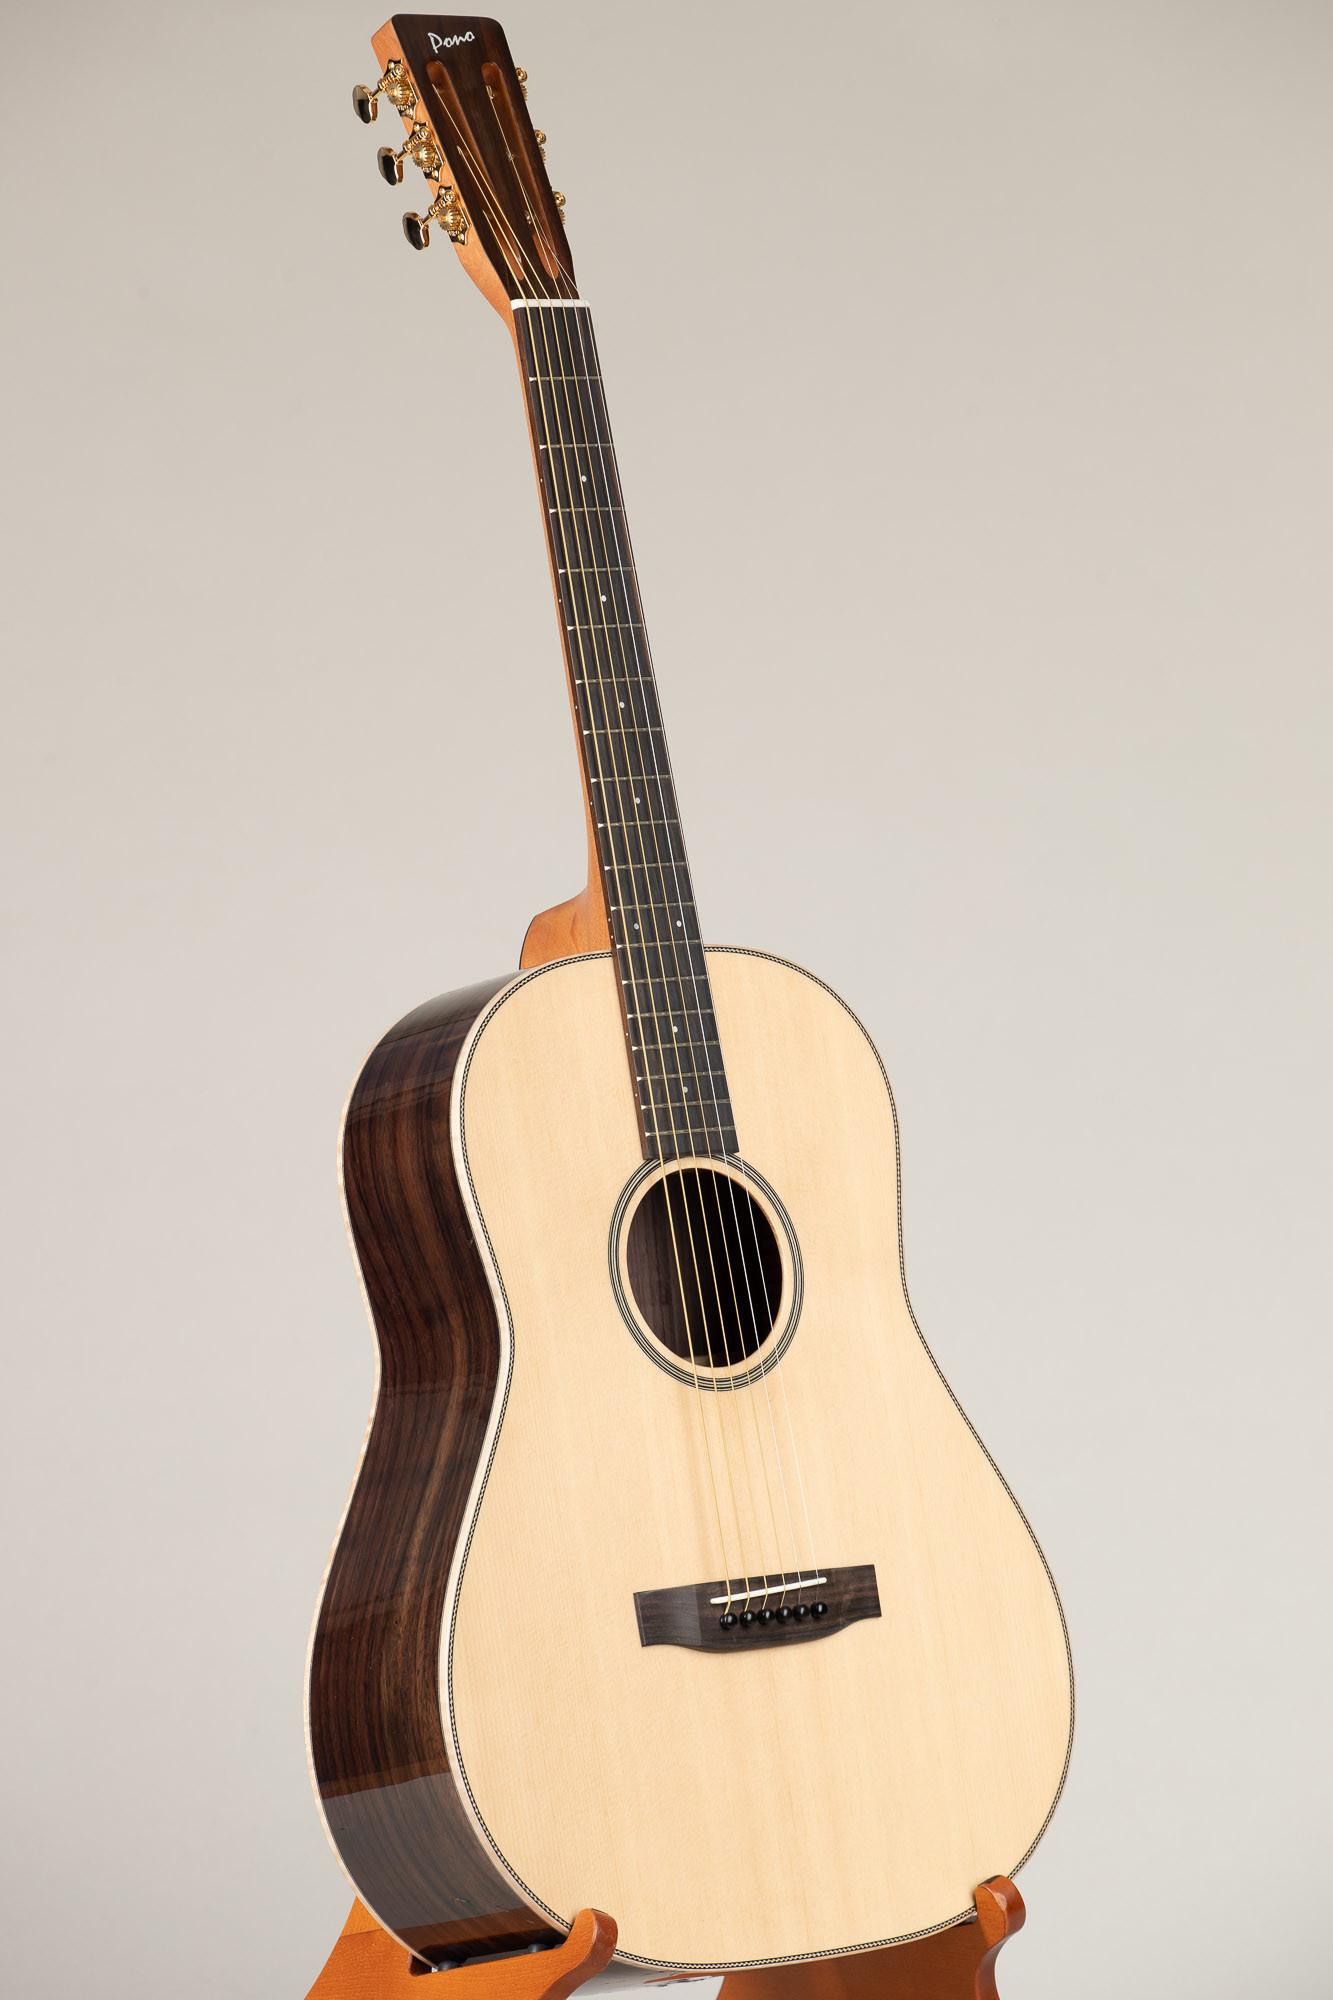 Pono Spruce Top Rosewood Sloped Shoulder Dreadnaught Guitar (DS-30 4736)